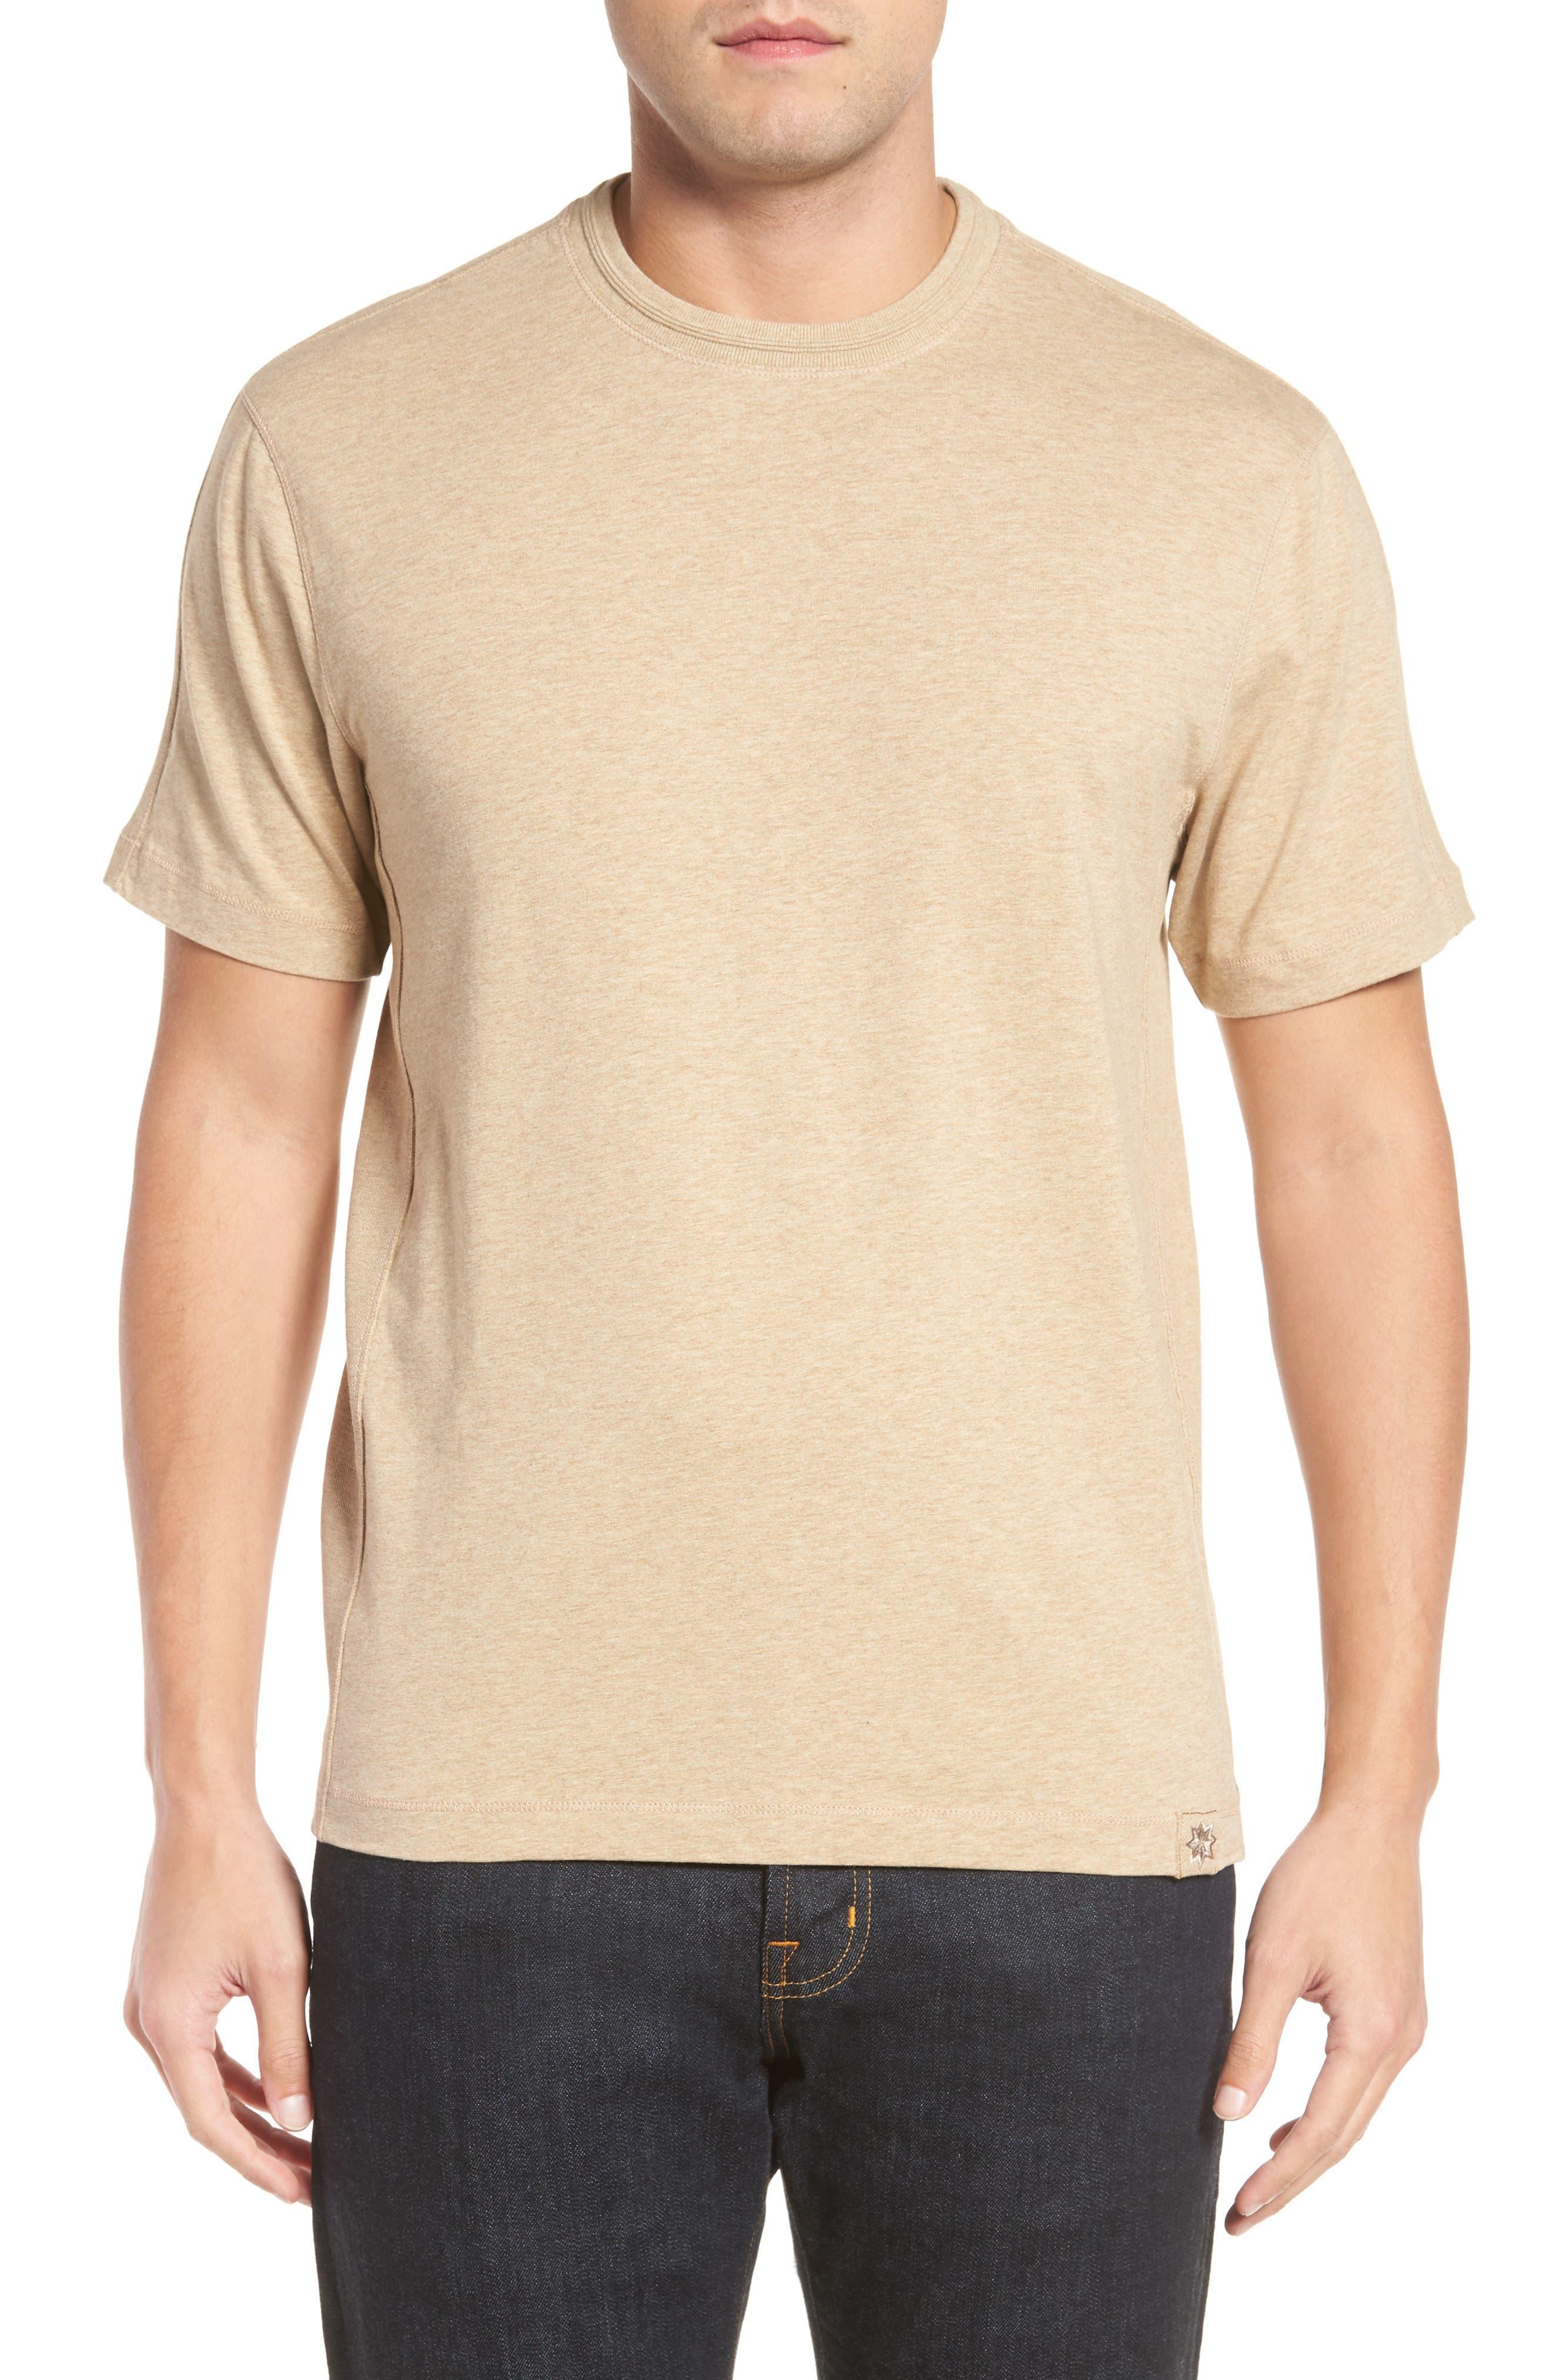 Main Image - Thaddeus Steve Stretch Jersey T-Shirt